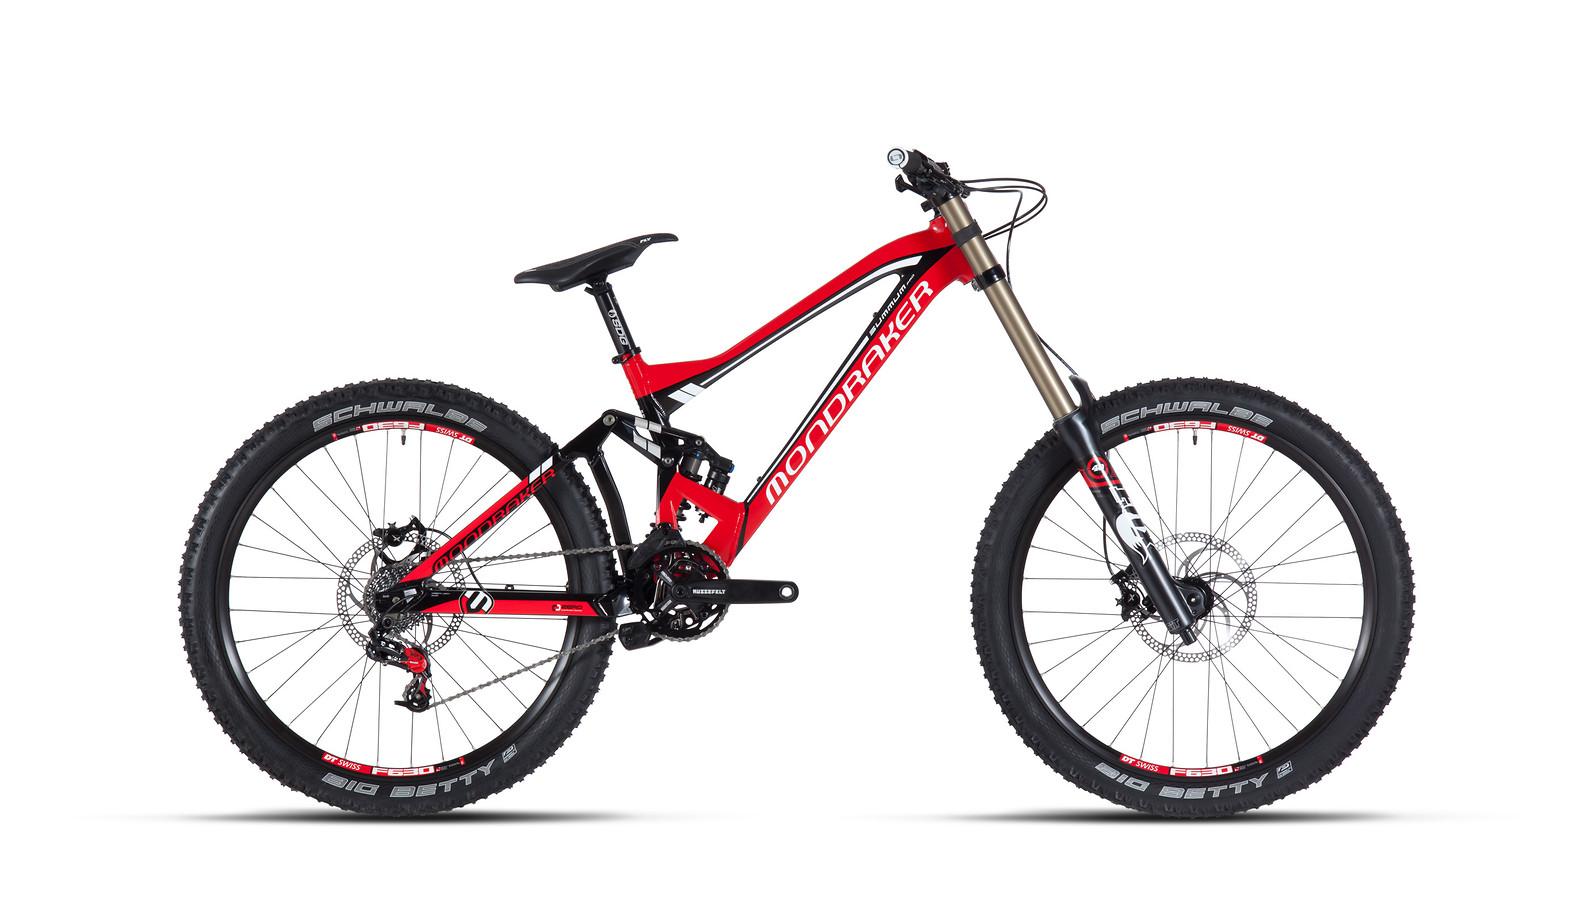 2013 Mondraker Summum Pro Bike bike - mondraker summum pro